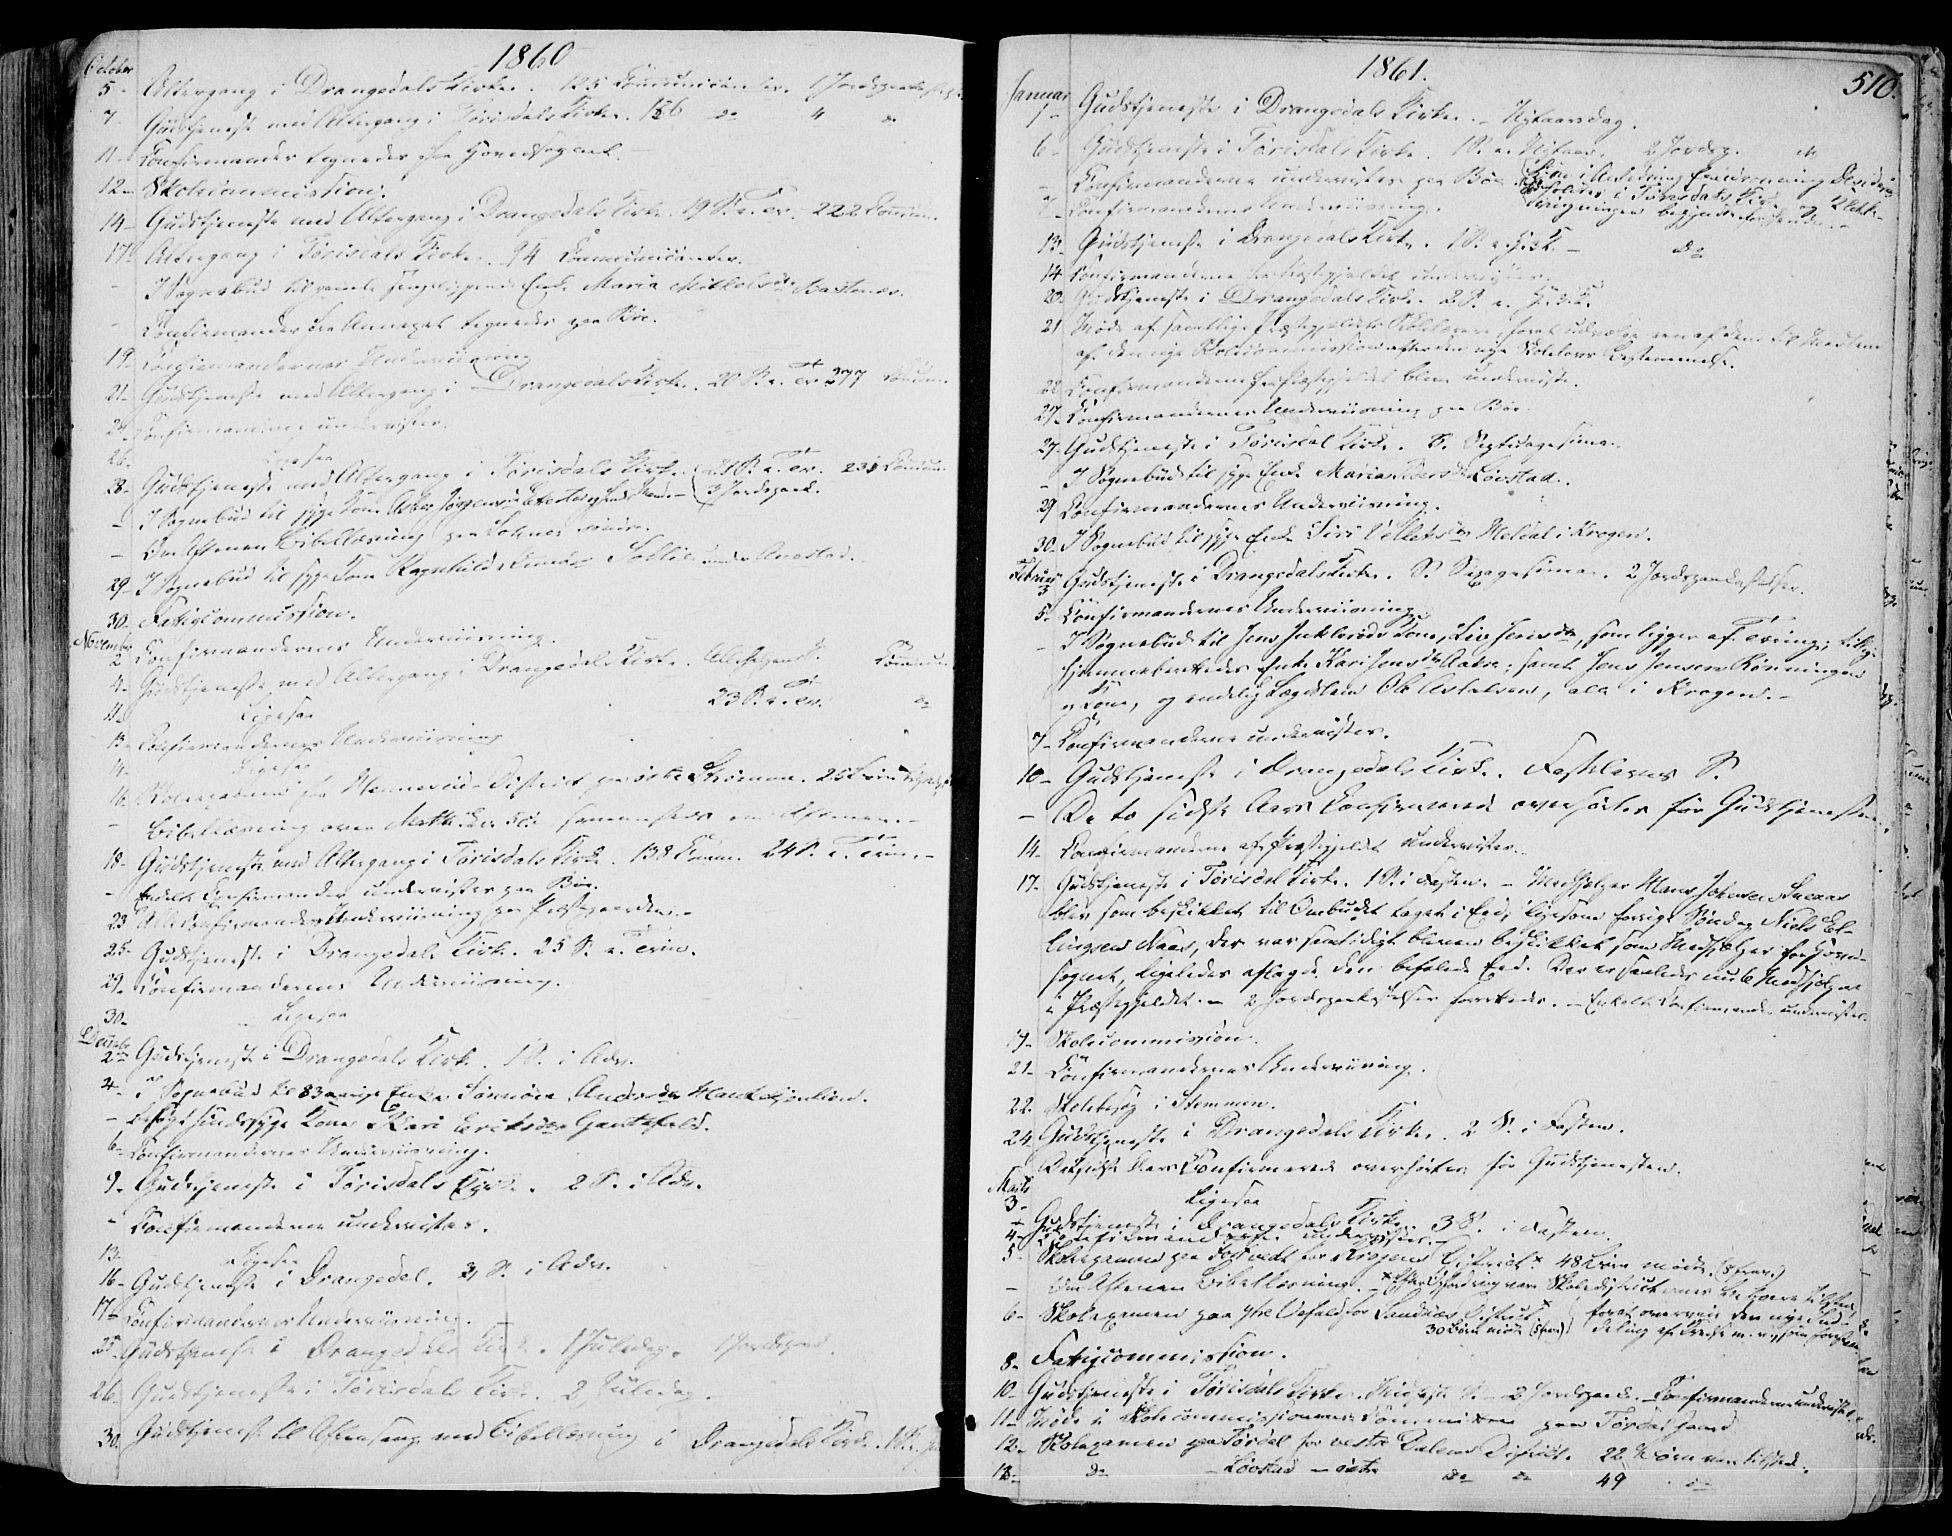 SAKO, Drangedal kirkebøker, F/Fa/L0008: Ministerialbok nr. 8, 1857-1871, s. 510